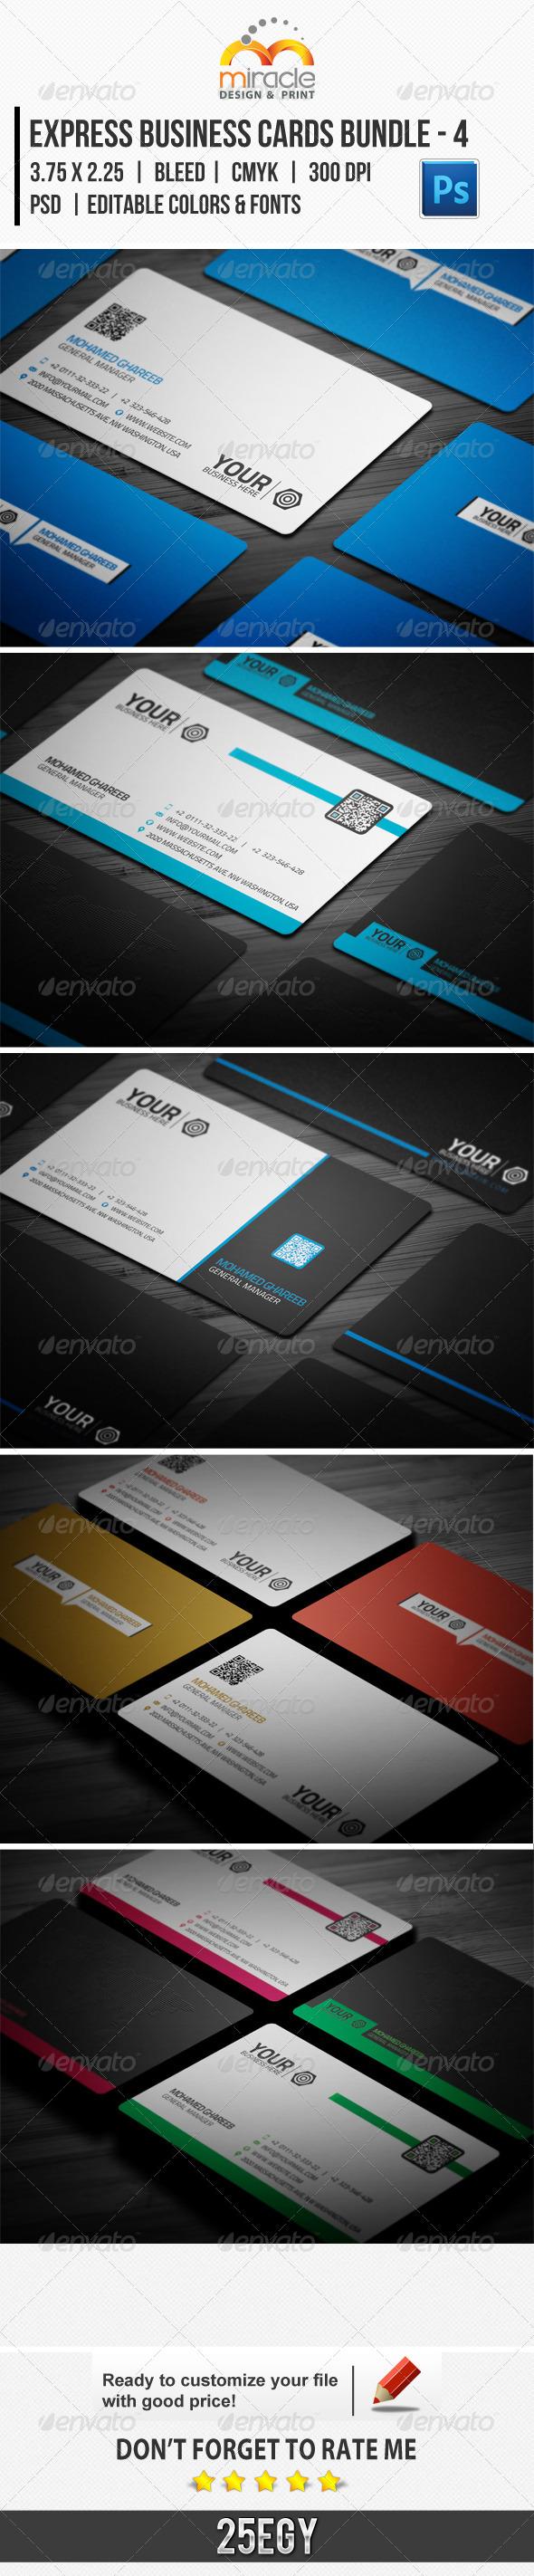 Express Business Cards Bundle - 4 - Business Cards Print Templates